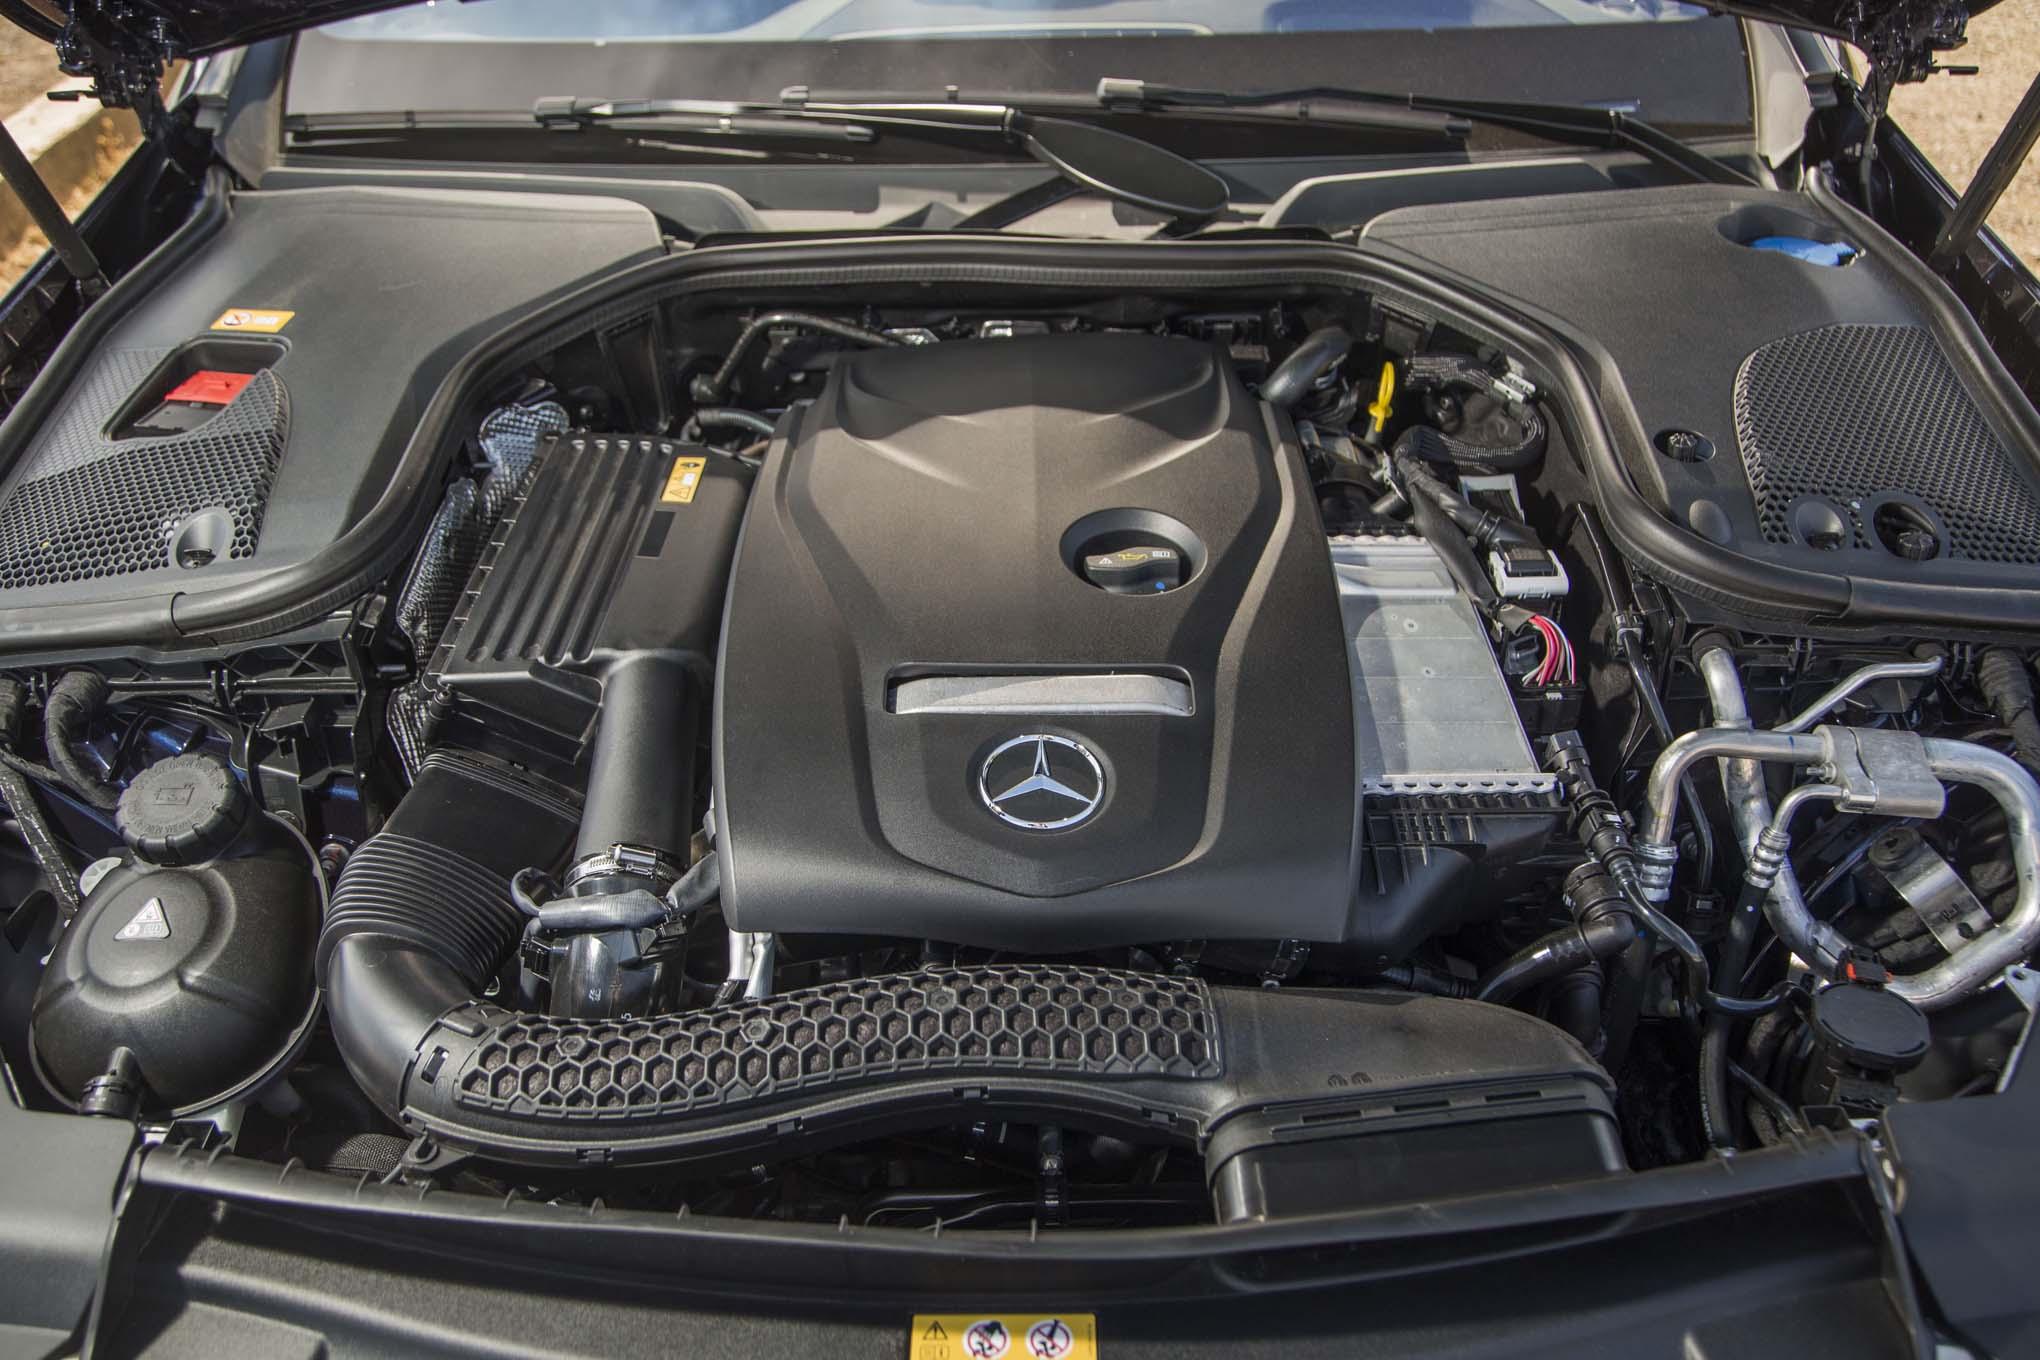 2017 Mercedes Ben E400 4matic Wagon One Week Review